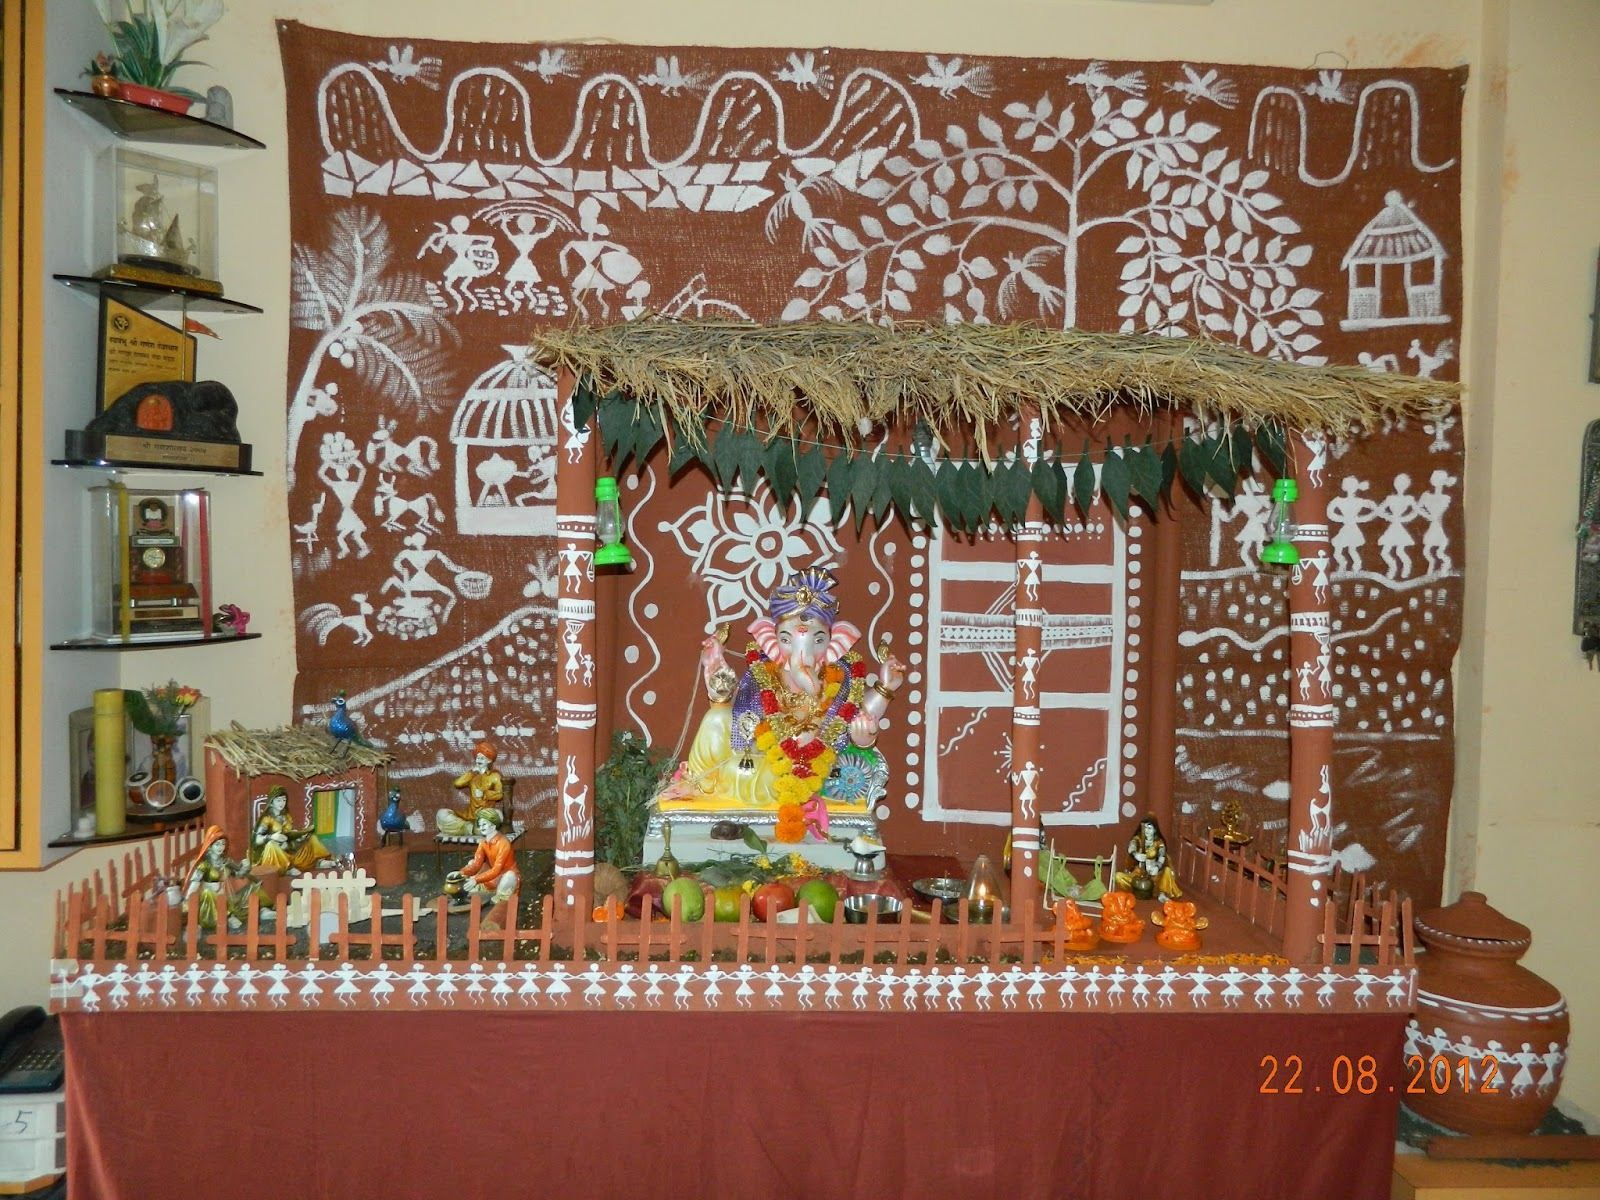 Warli Village Ganpati Decoration Theme Ganapati Eco Friendly Ganesh Chaturthi